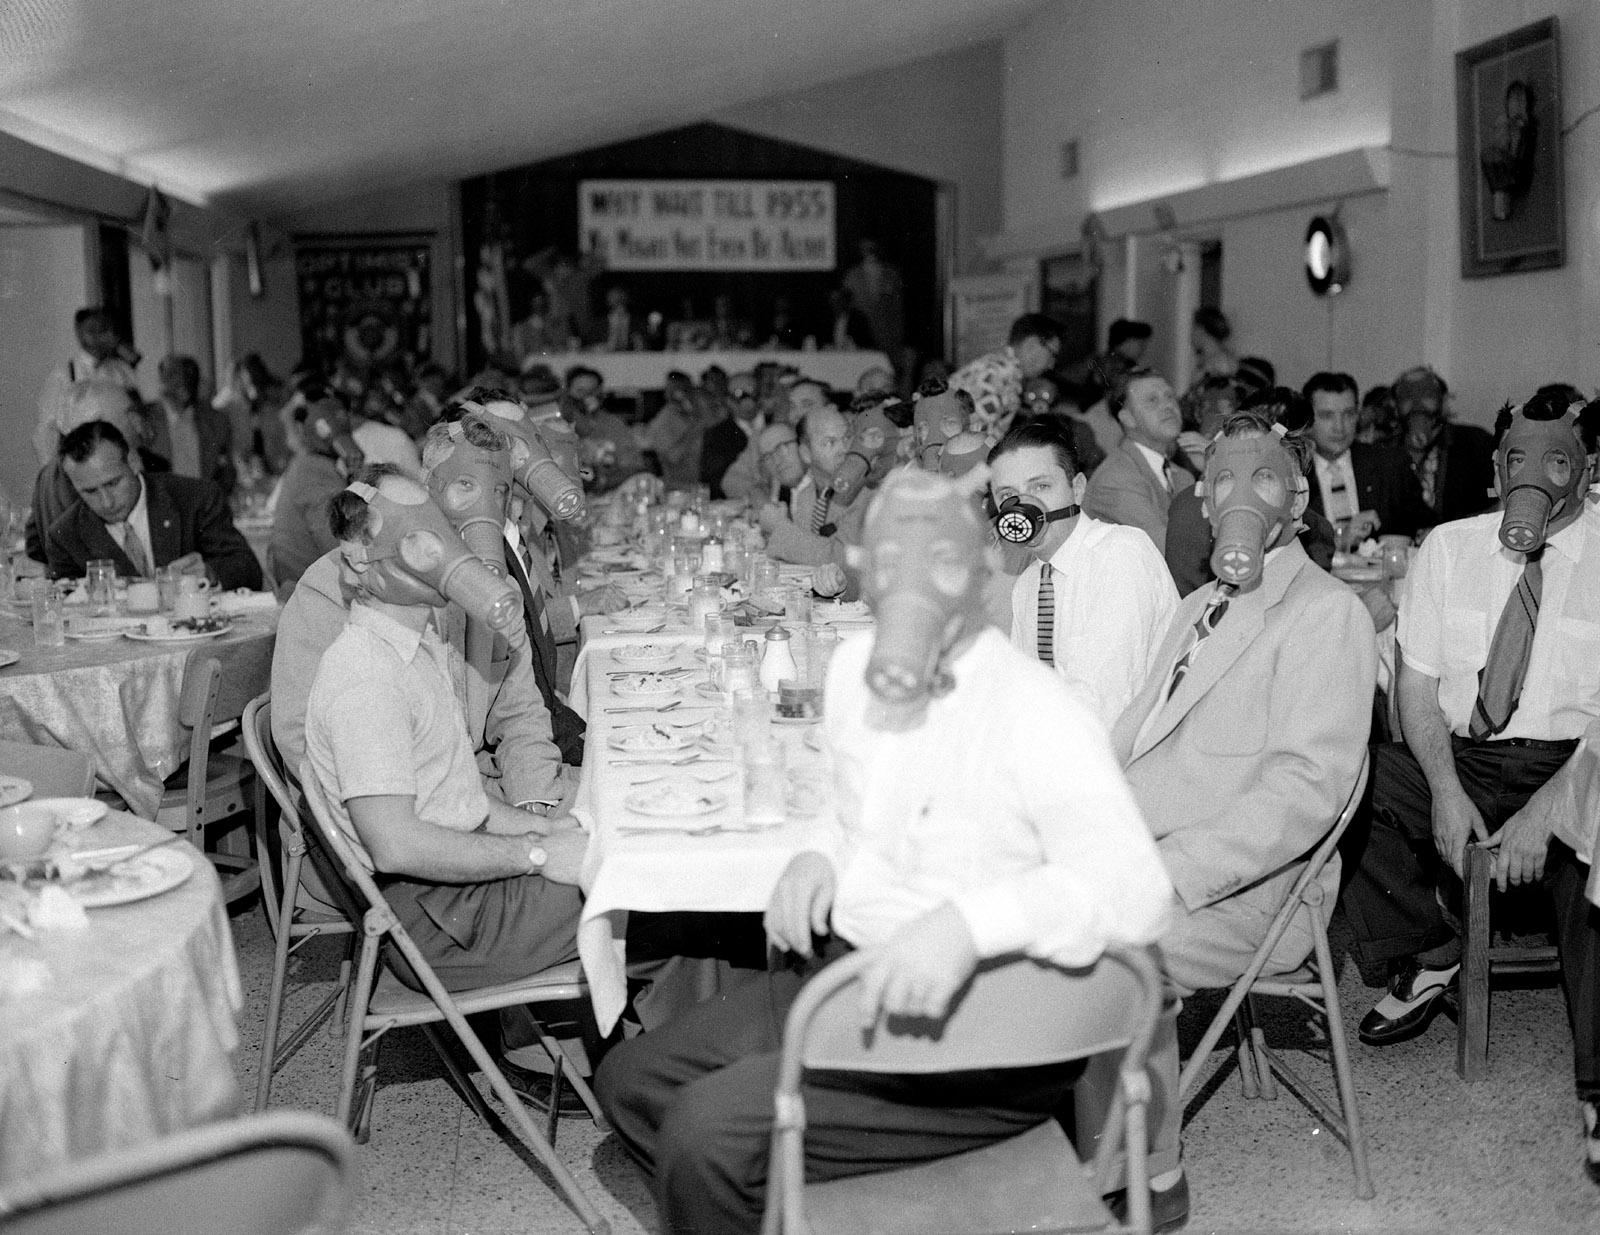 Highland Park Optimist Club members wearing smog gas masks at a banquet, Los Angeles, circa 1954